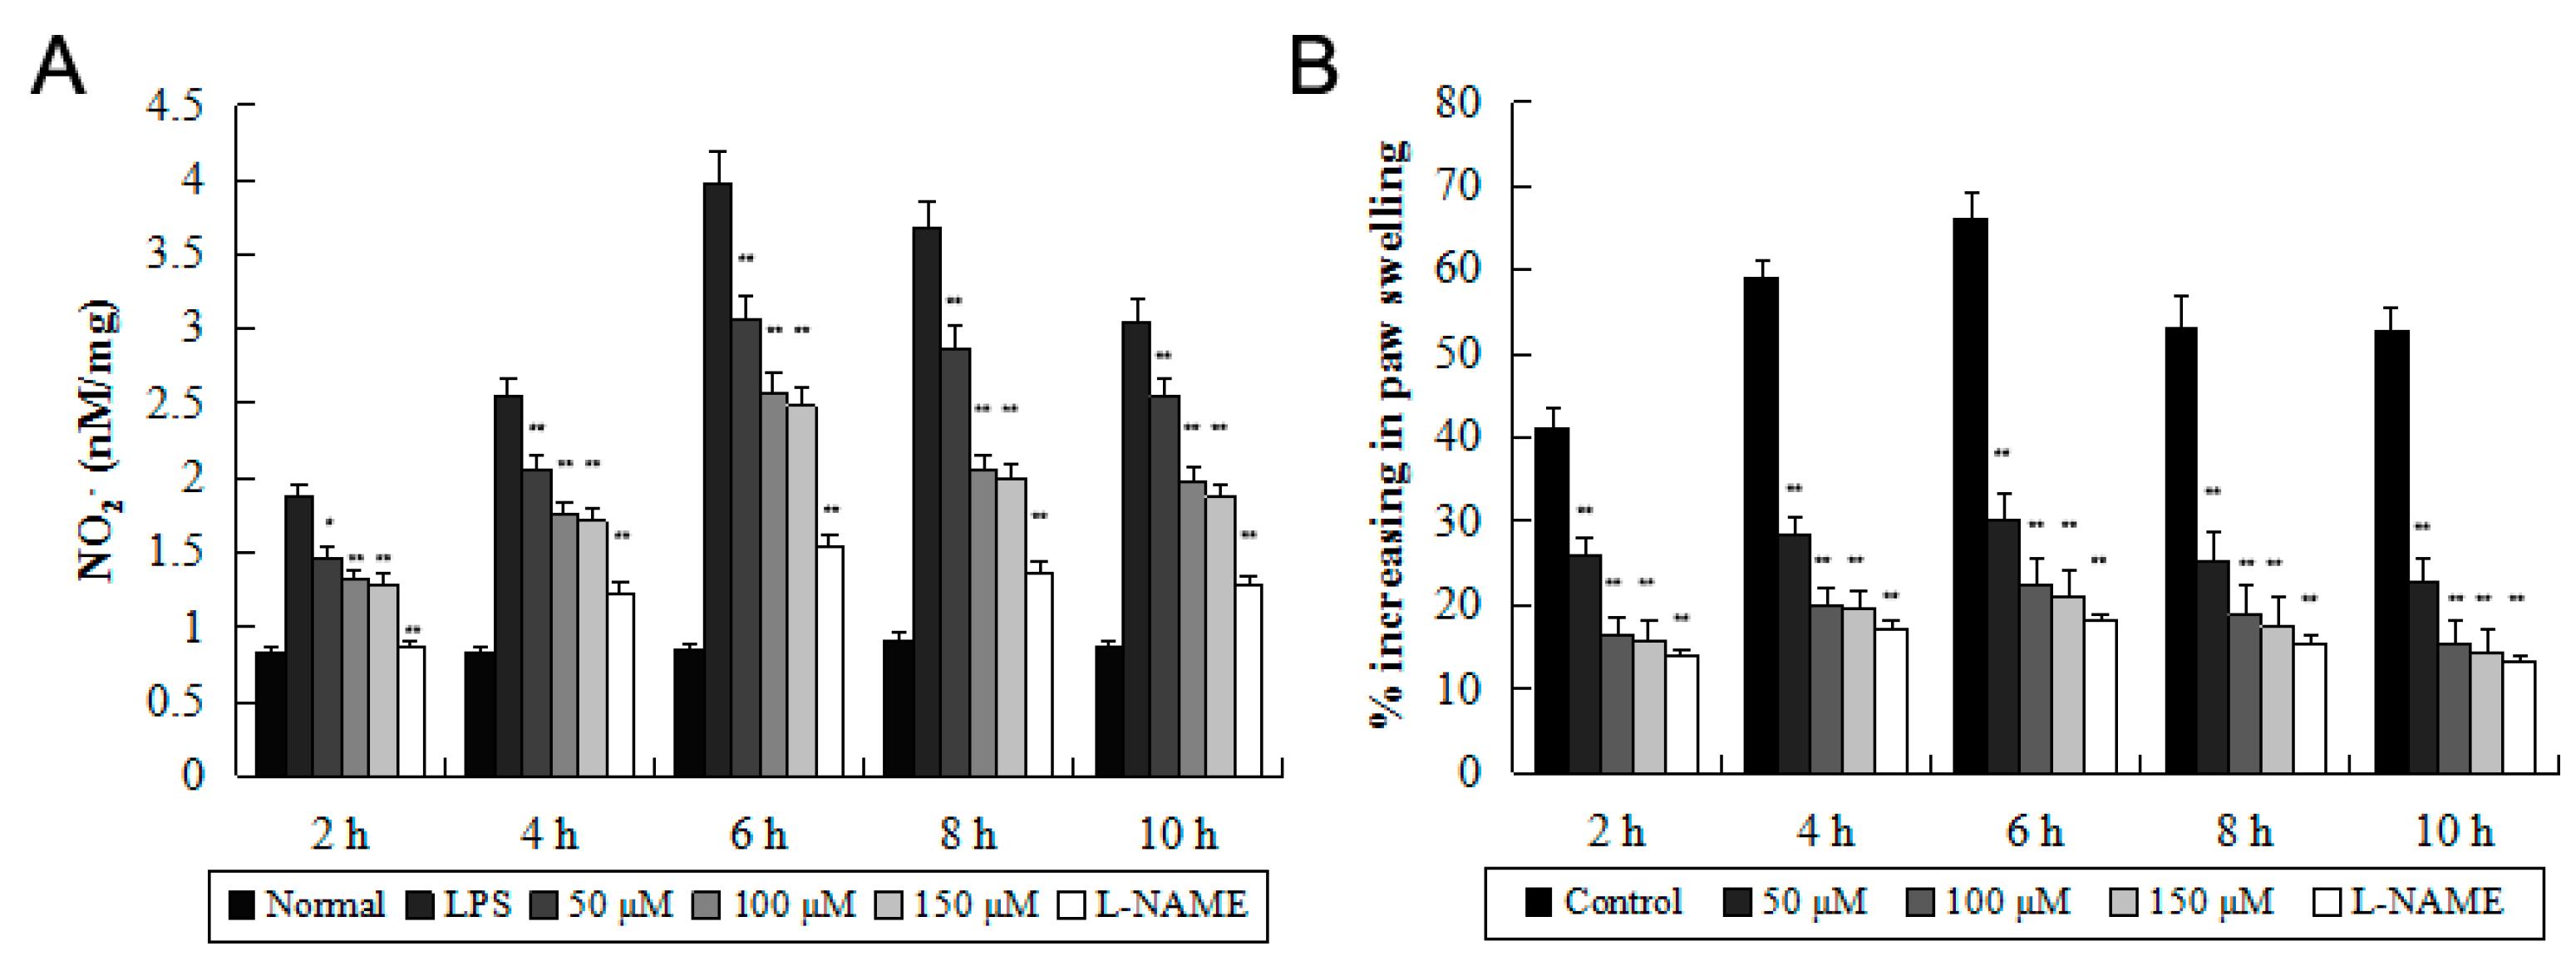 carrageenan induced paw edema pdf